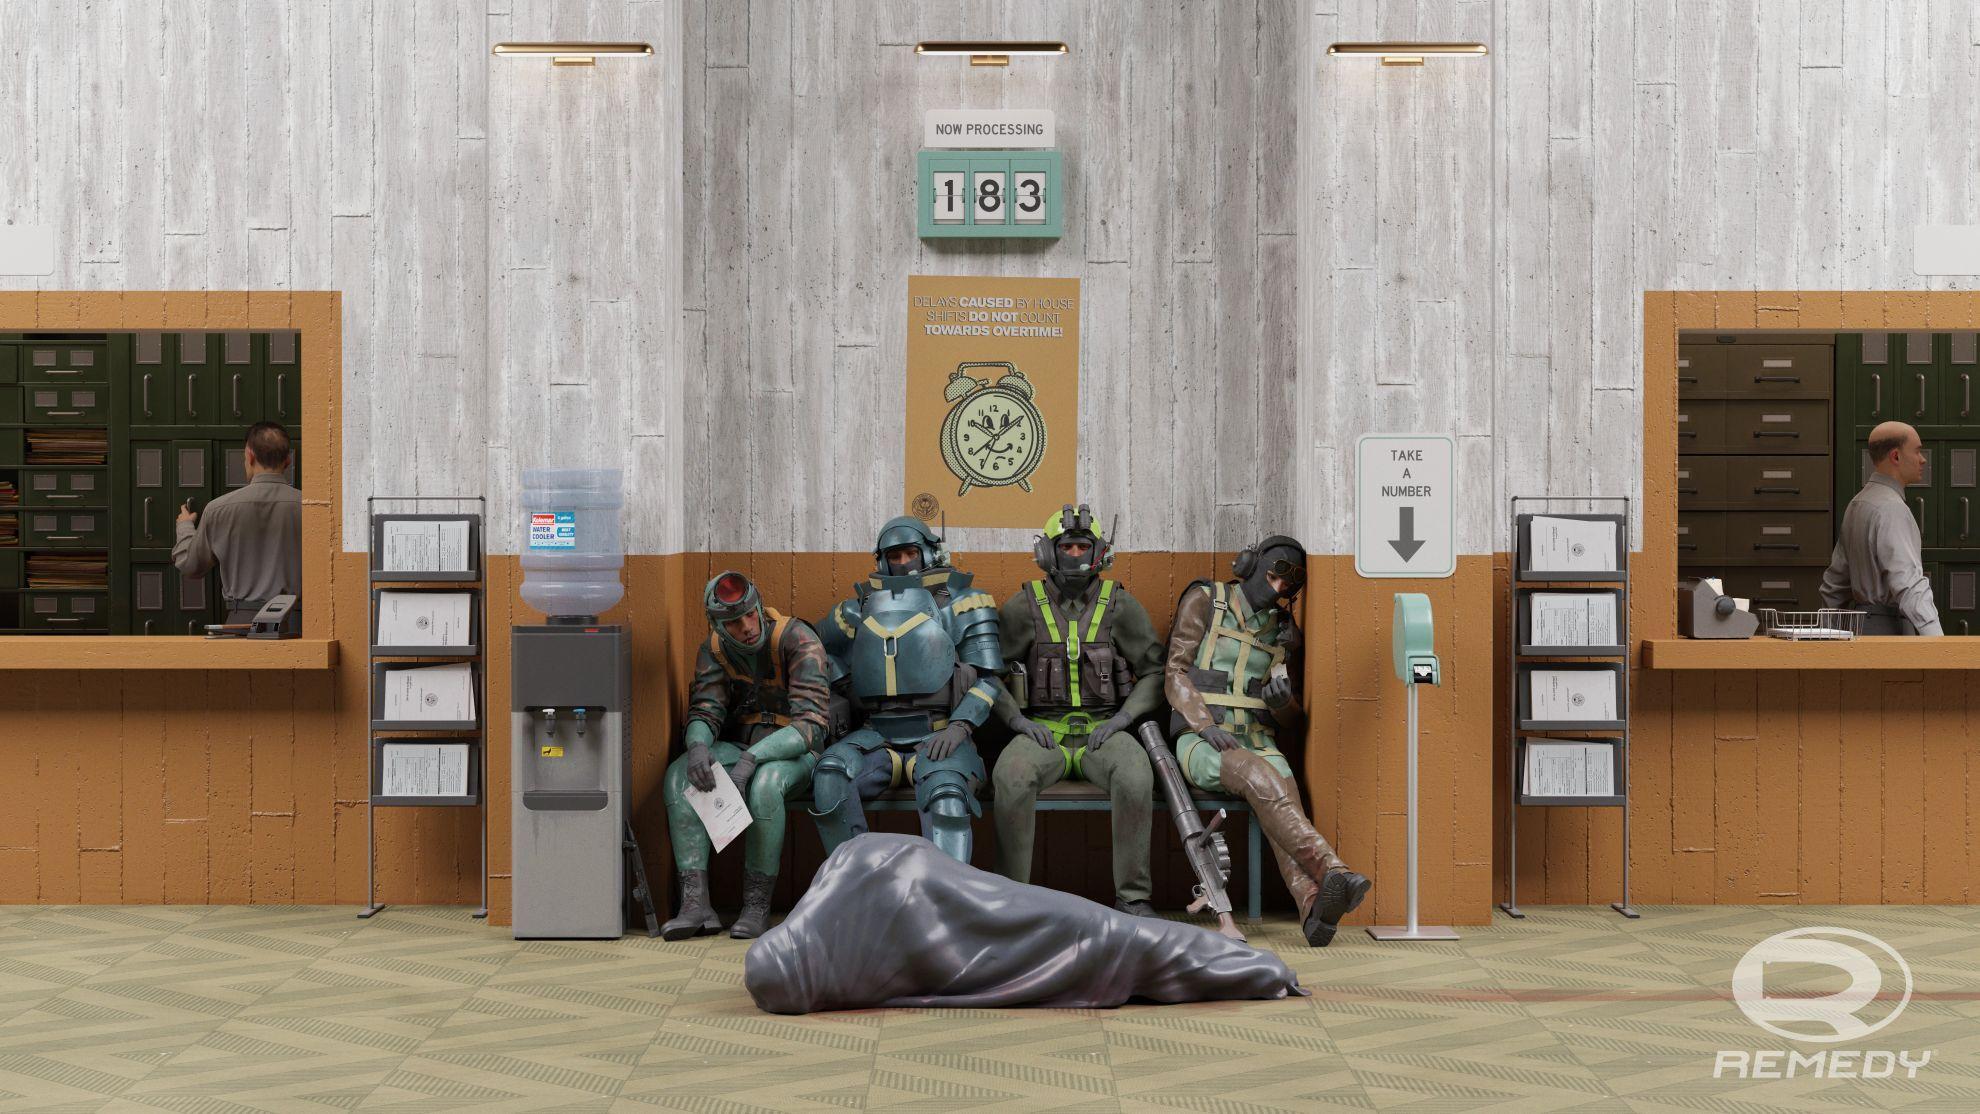 Condor waiting room